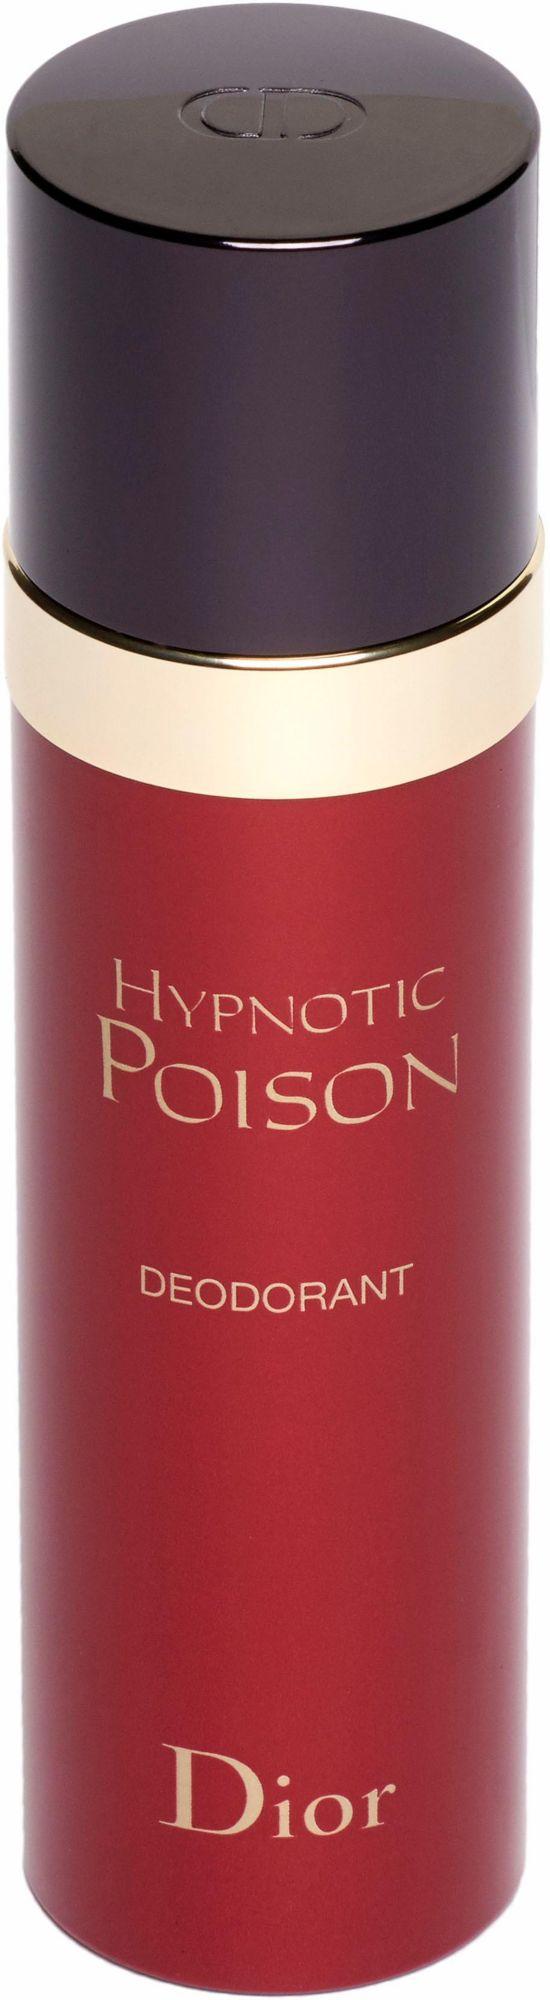 DIOR Dior, »Hypnotic Poison«, Deodorant